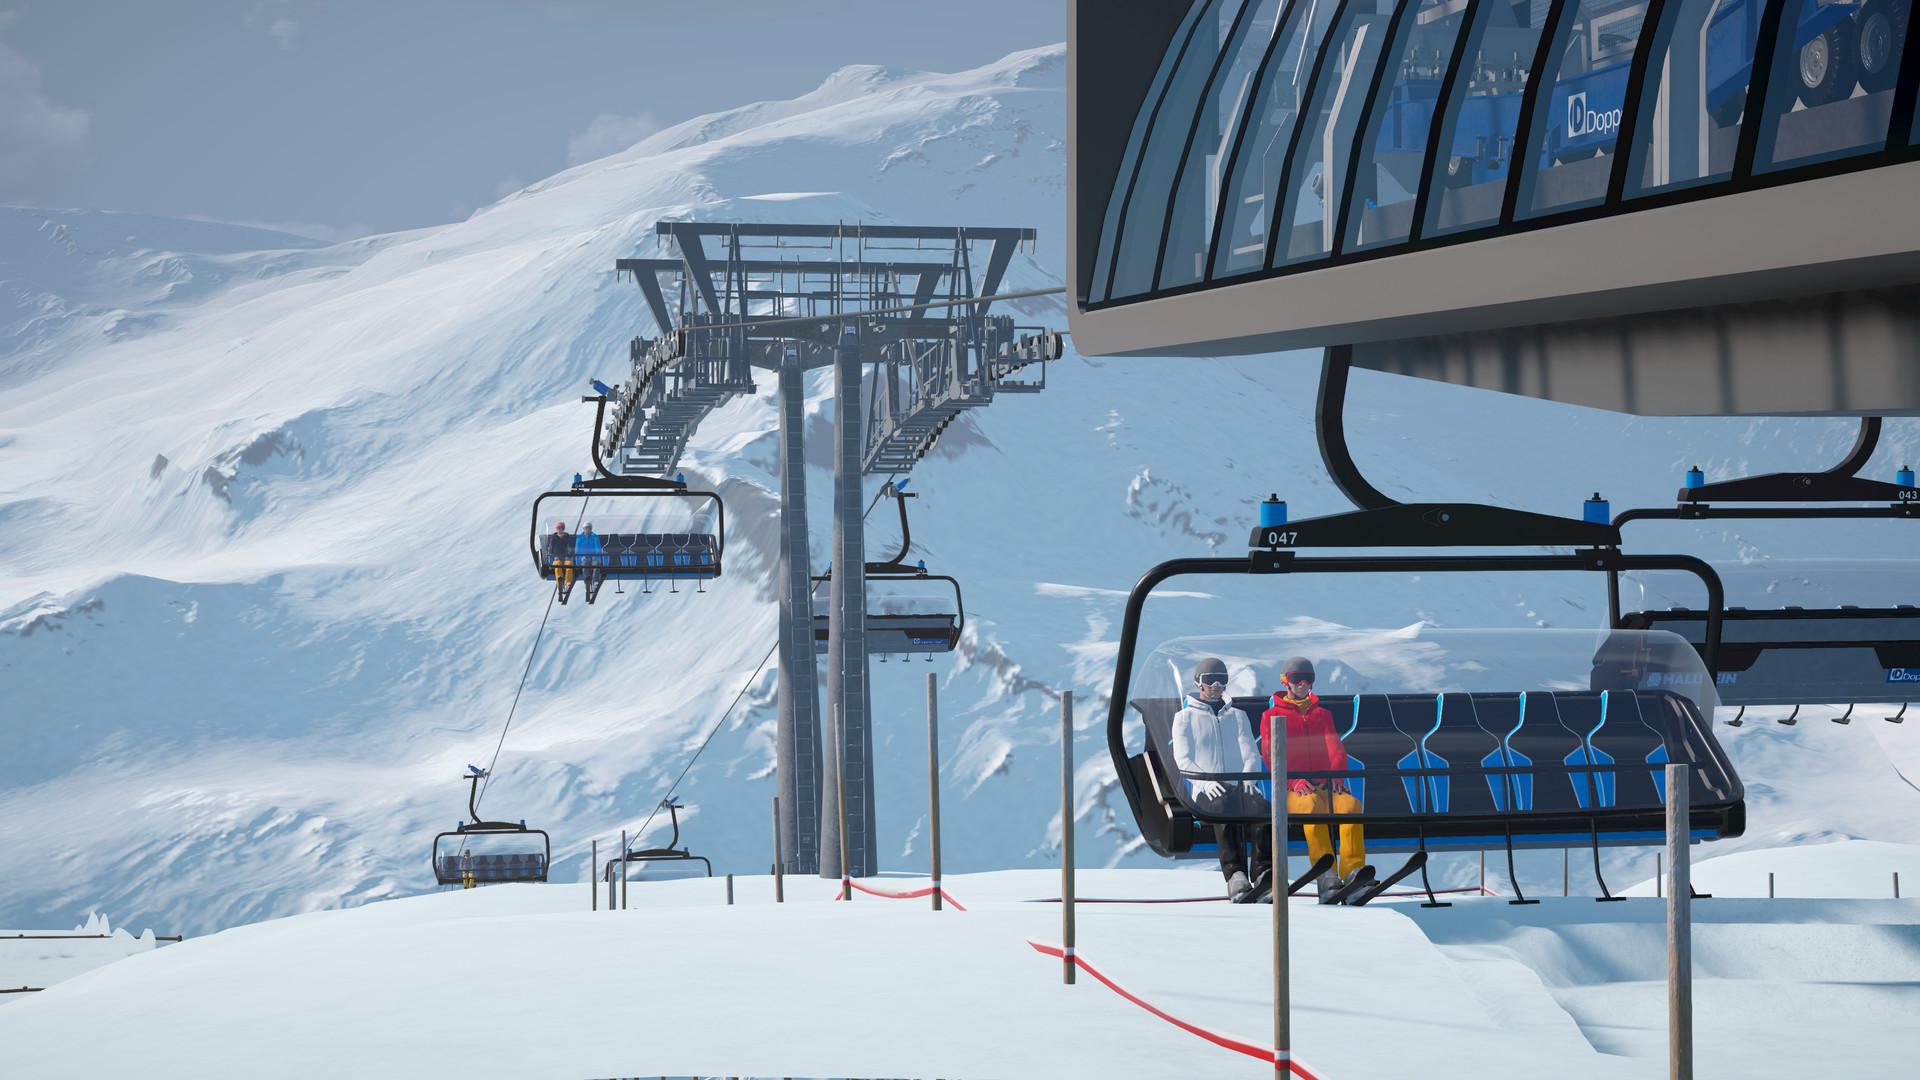 winter-resort-simulator-s2-pc-screenshot-04